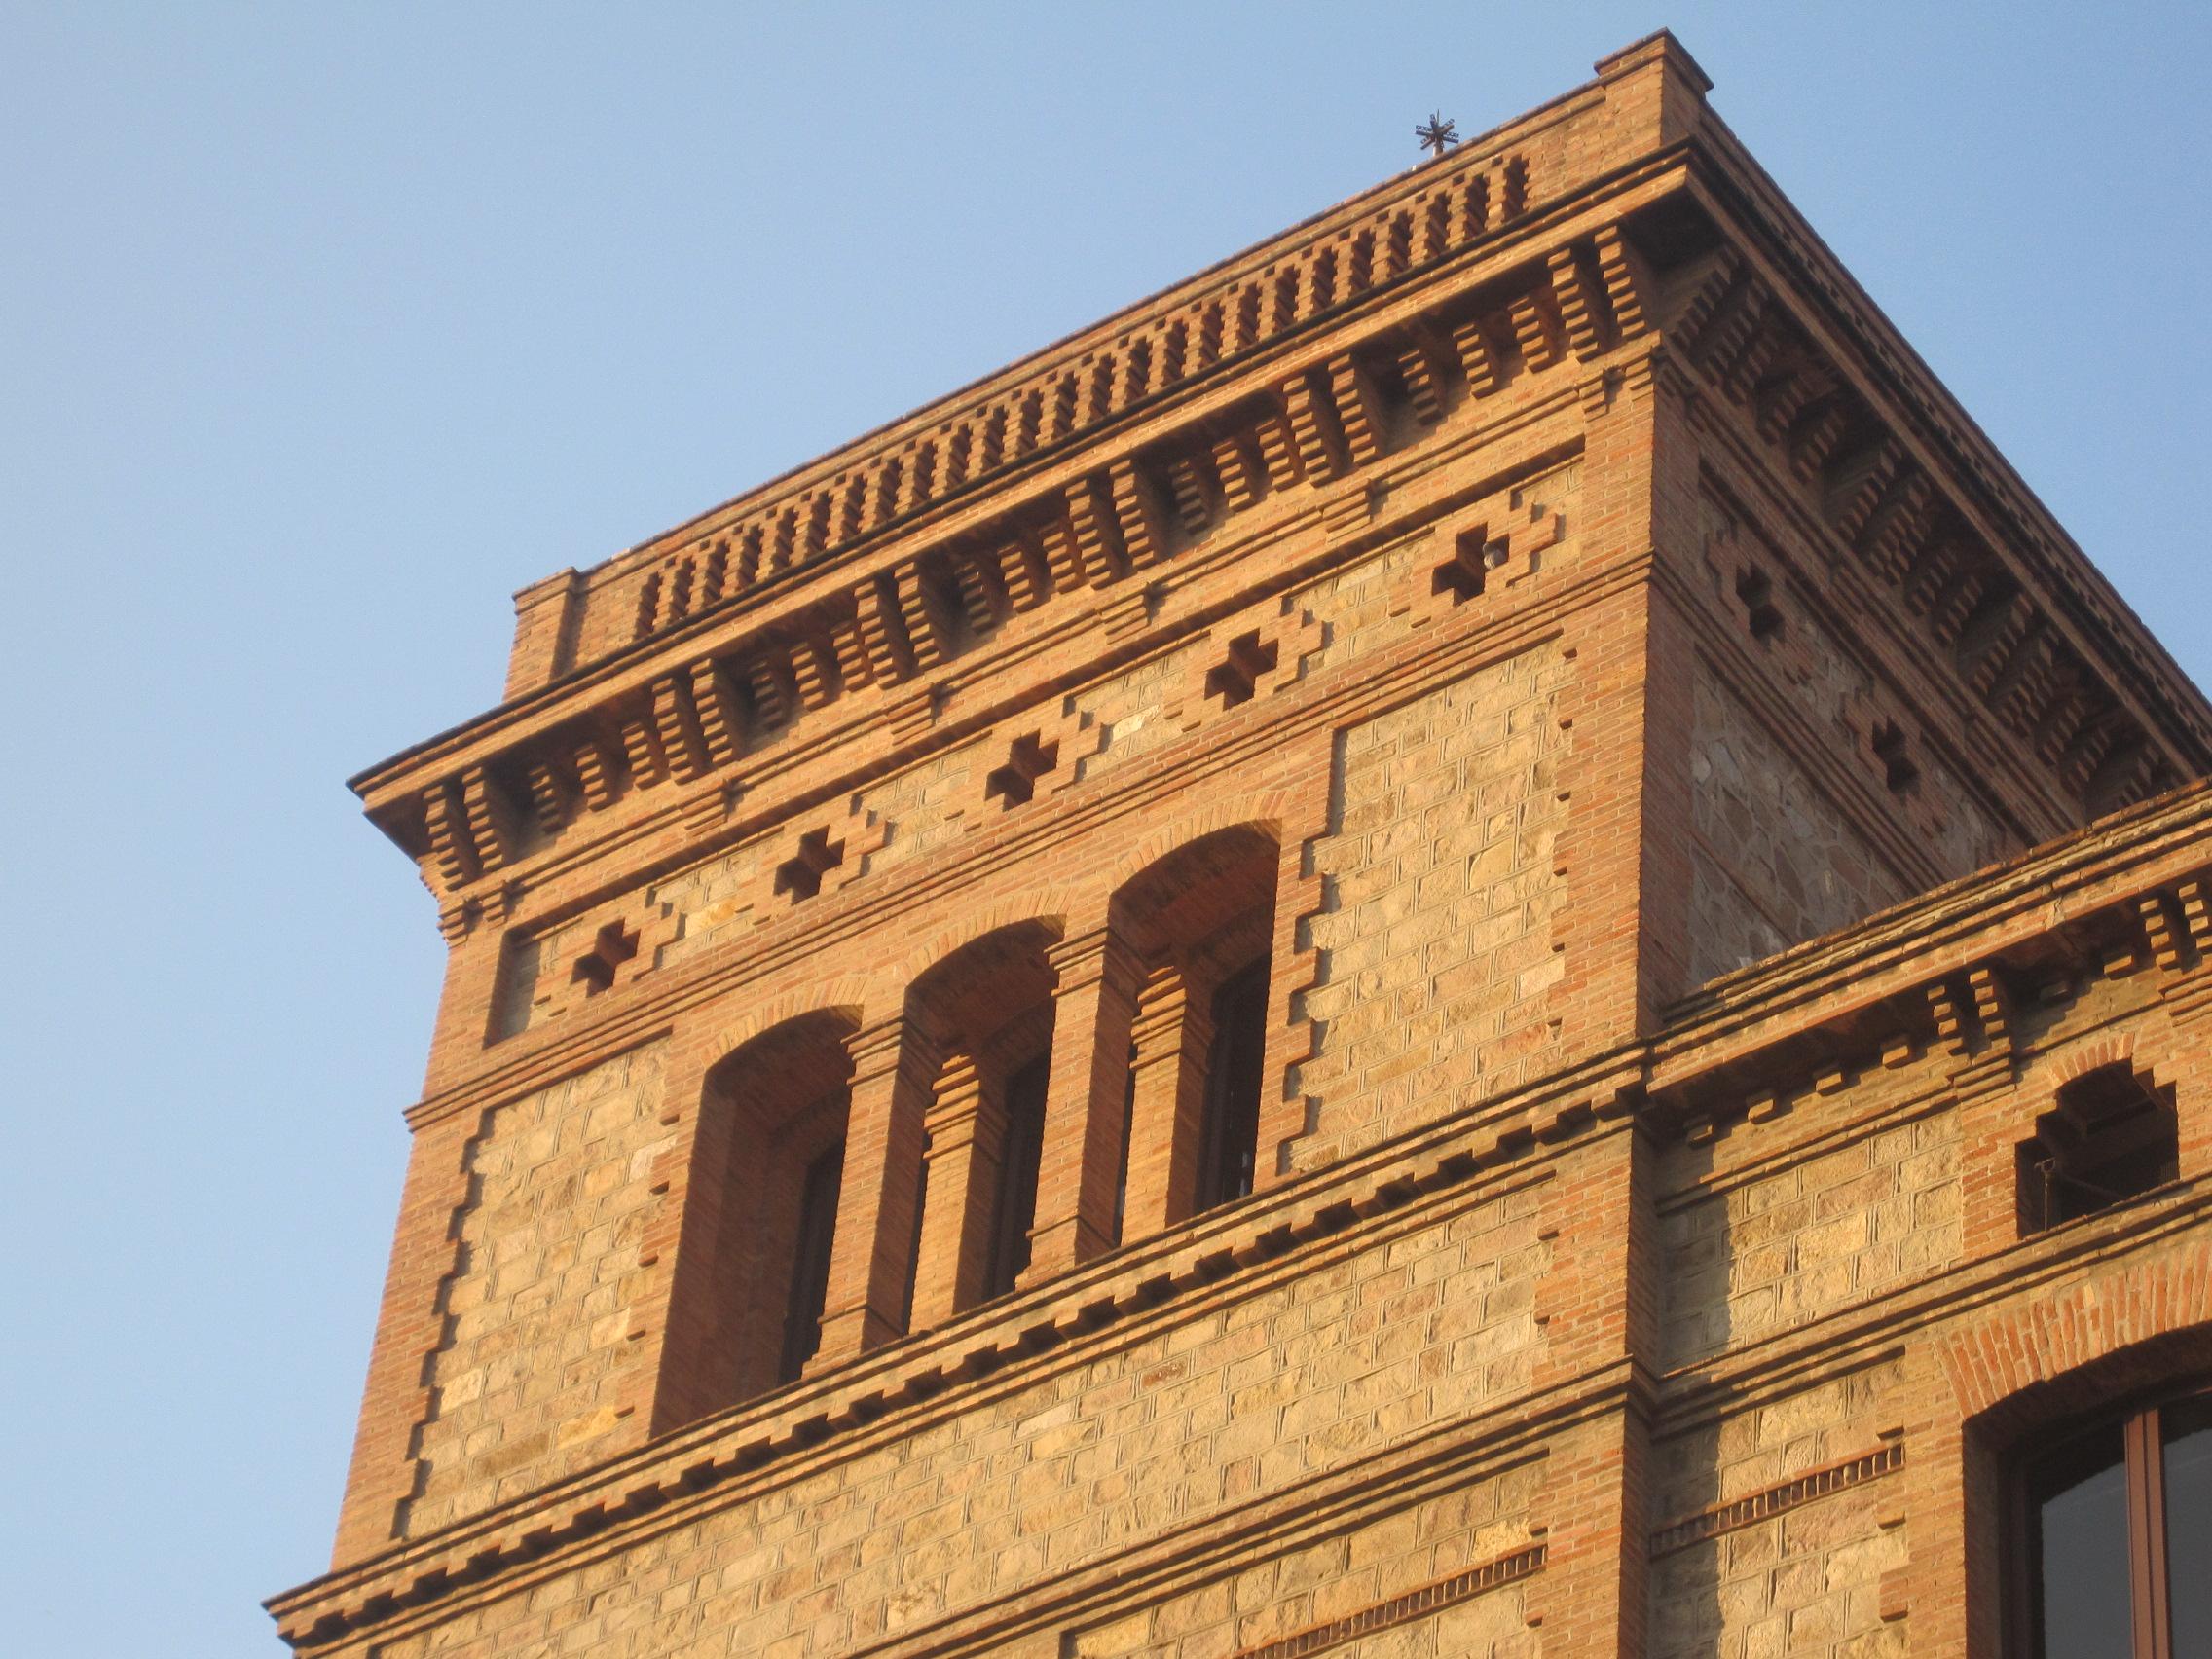 Edificio reloj can Batlló. Detalle ladrillo visto